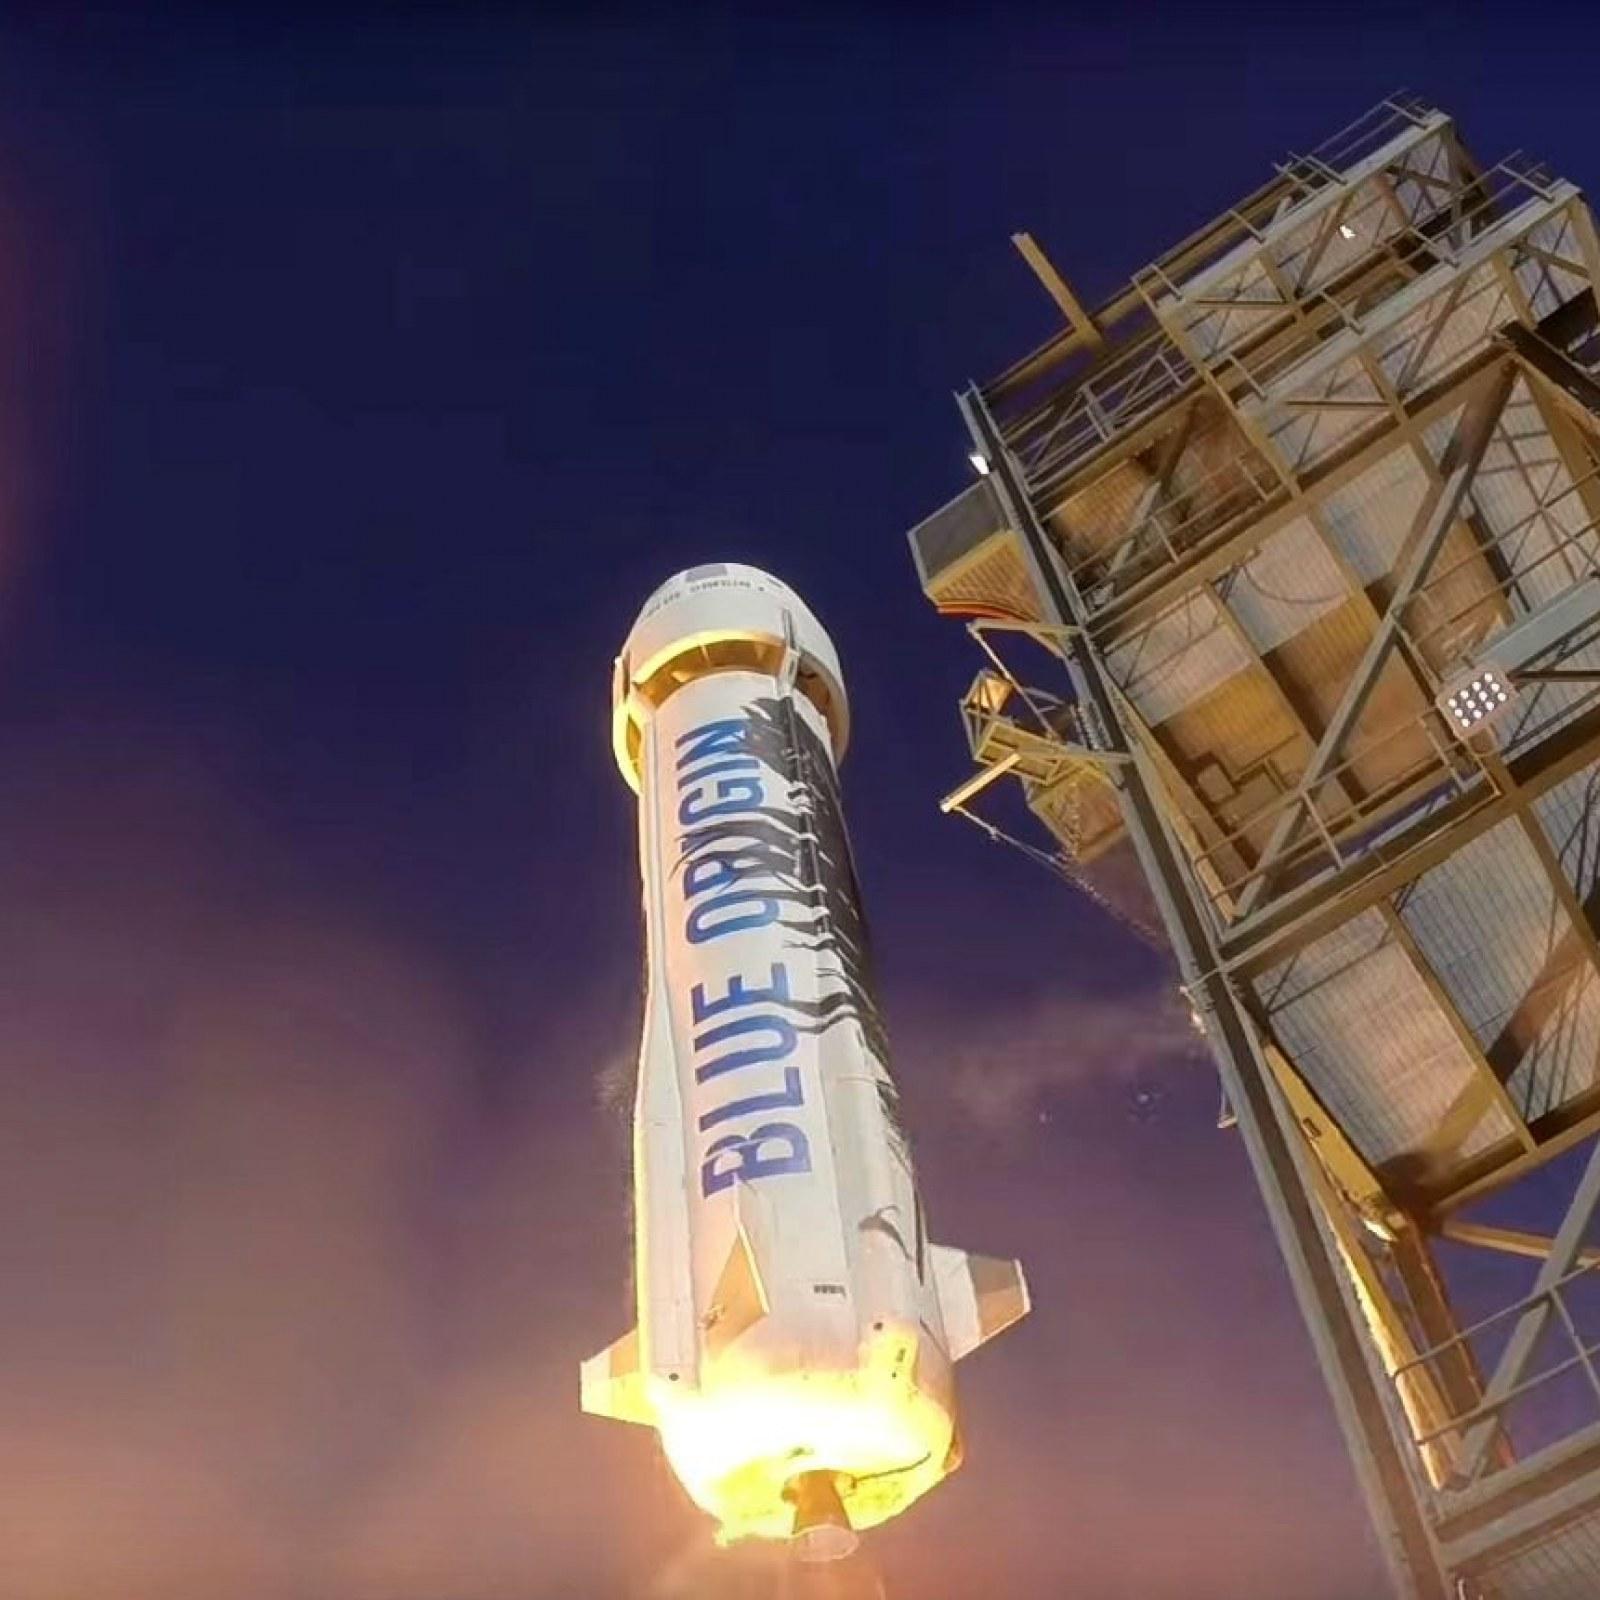 Jeff Bezos Sells $1 Billion in Amazon Stock to Fund Space Race